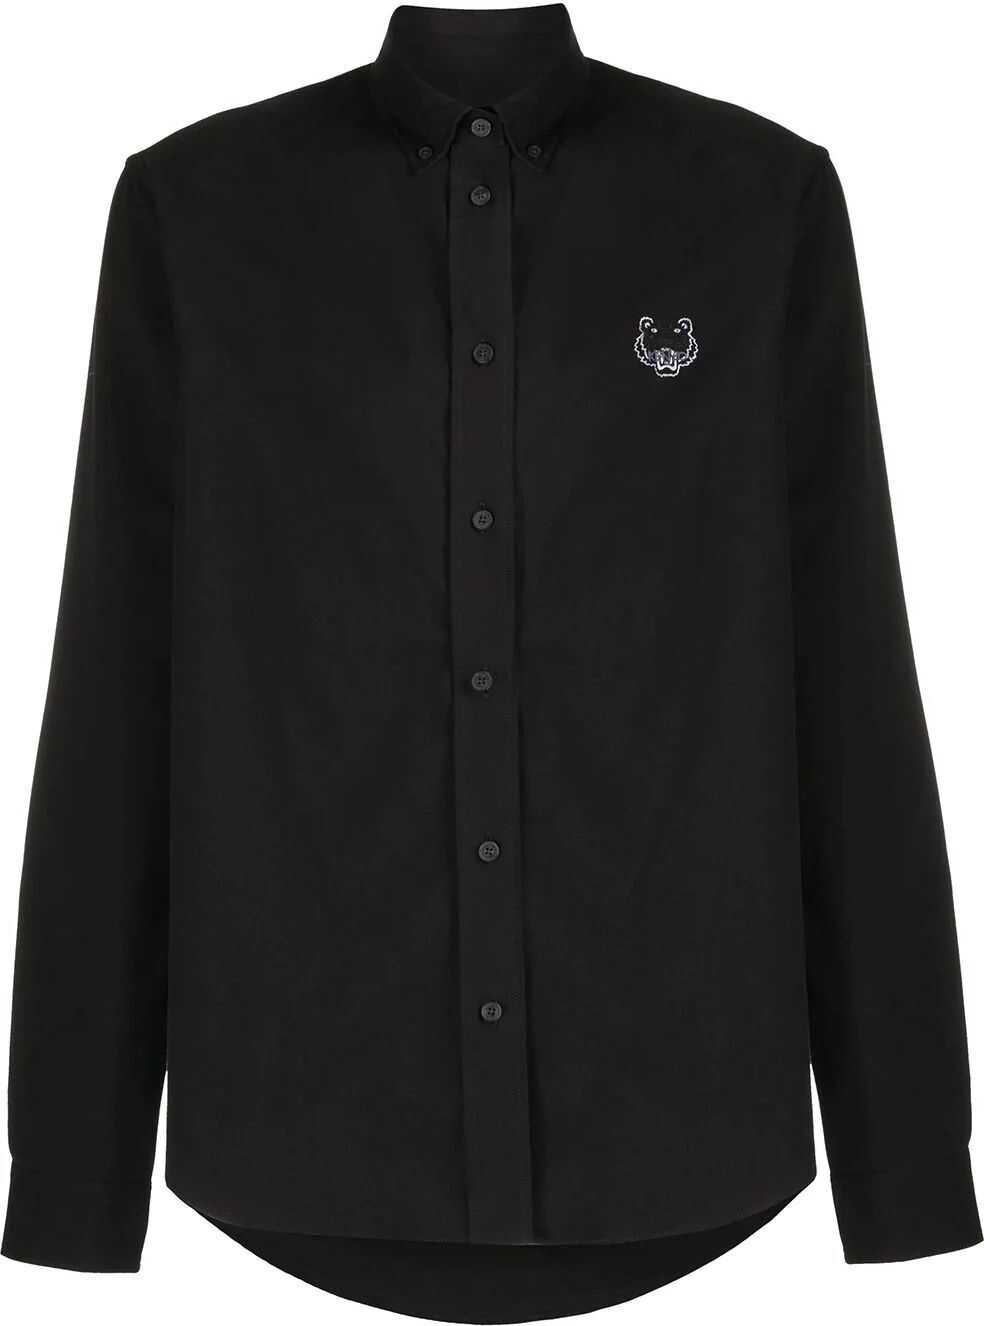 Kenzo Cotton Shirt BLACK